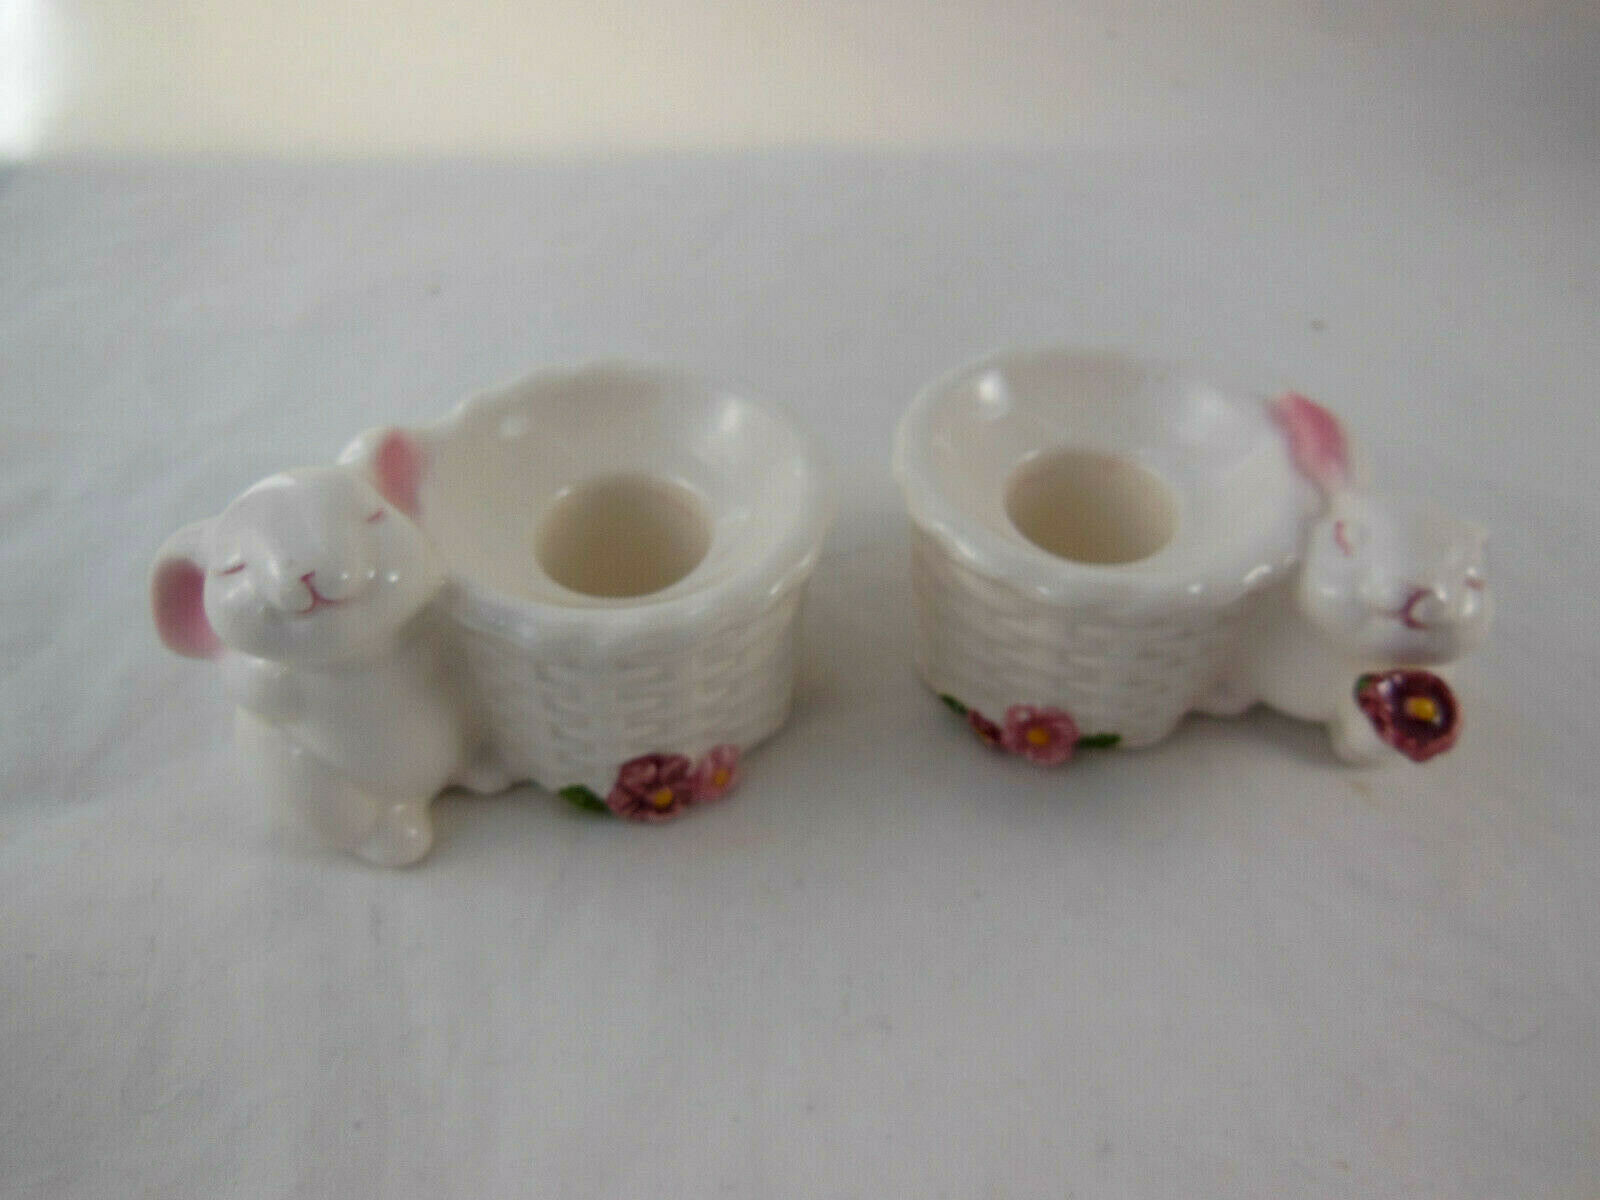 Vintage Avon Bunny Taper Candle Holders Ceramic Rabbit Easter Unused in Box